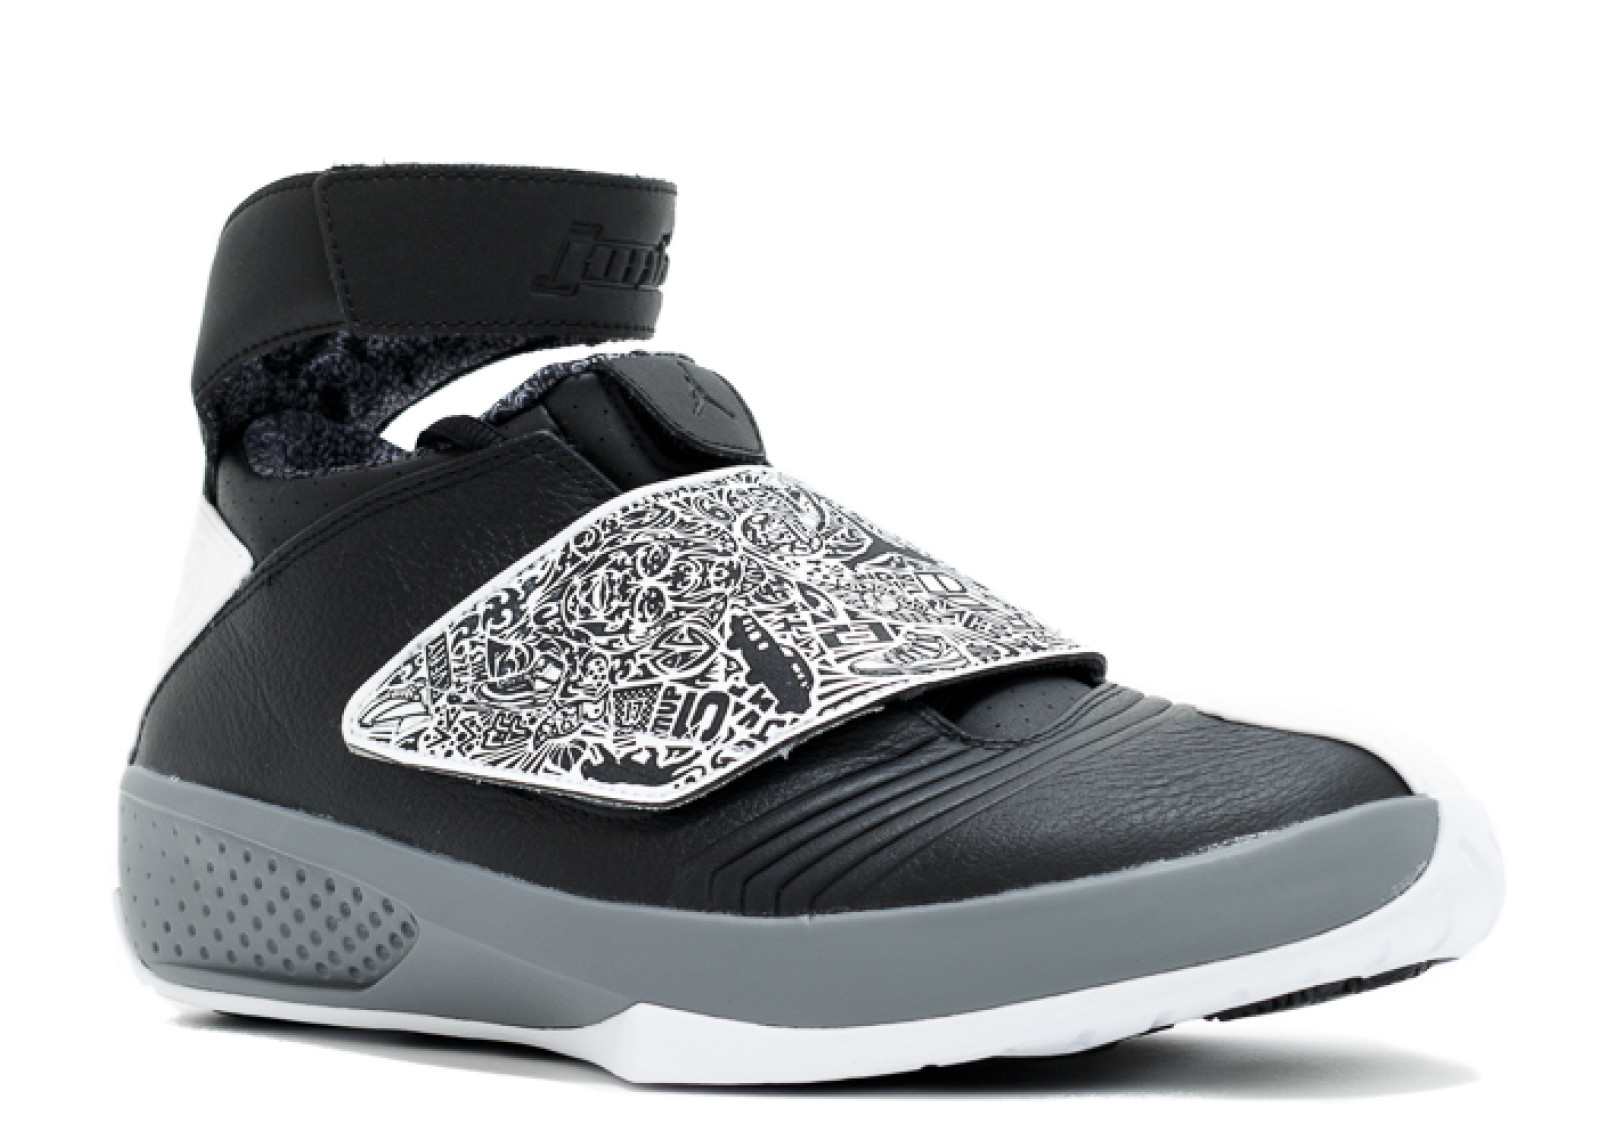 80540d26b433 Air Jordan - Men - Air Jordan 20  Playoff  - 310455-003 - Size 8